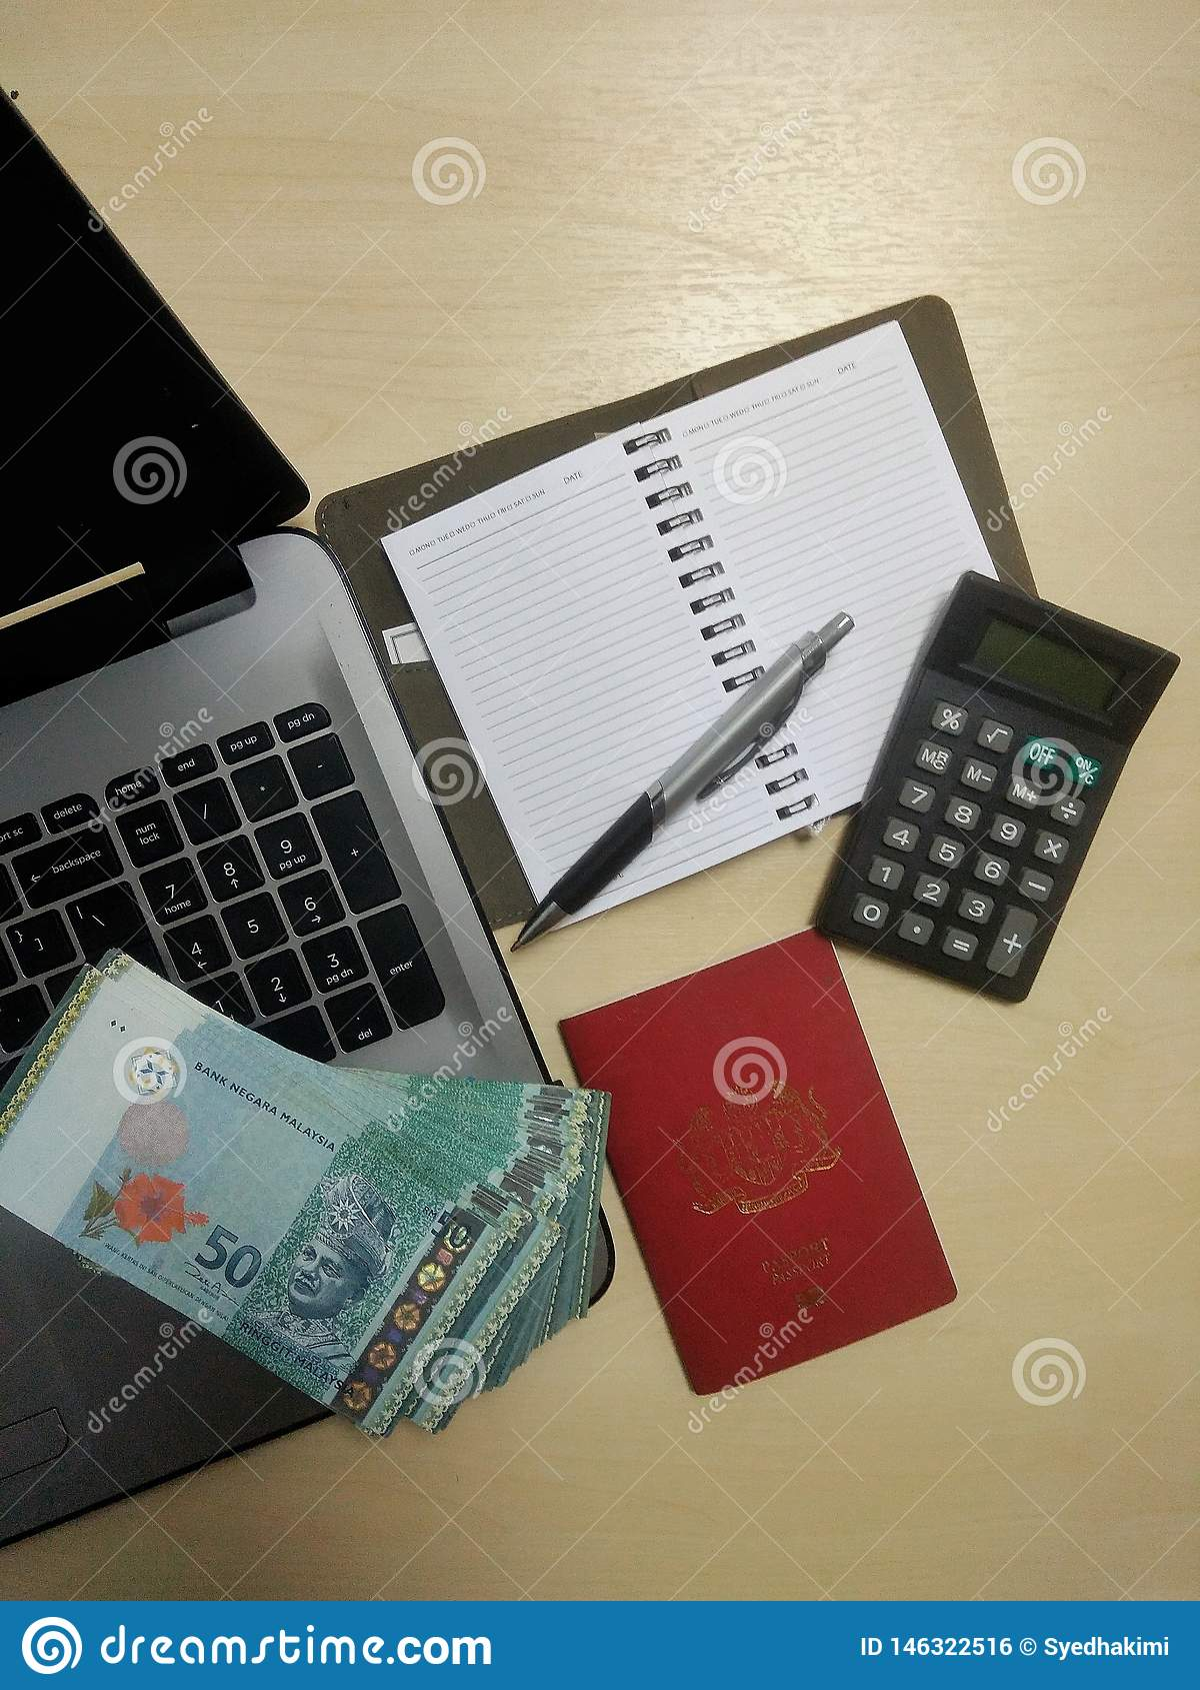 Lap-top, χρήματα, διαβατήριο, μάνδρα, υπολογιστής, γραφείο, σημειωματάριο με τις κενές σελίδες